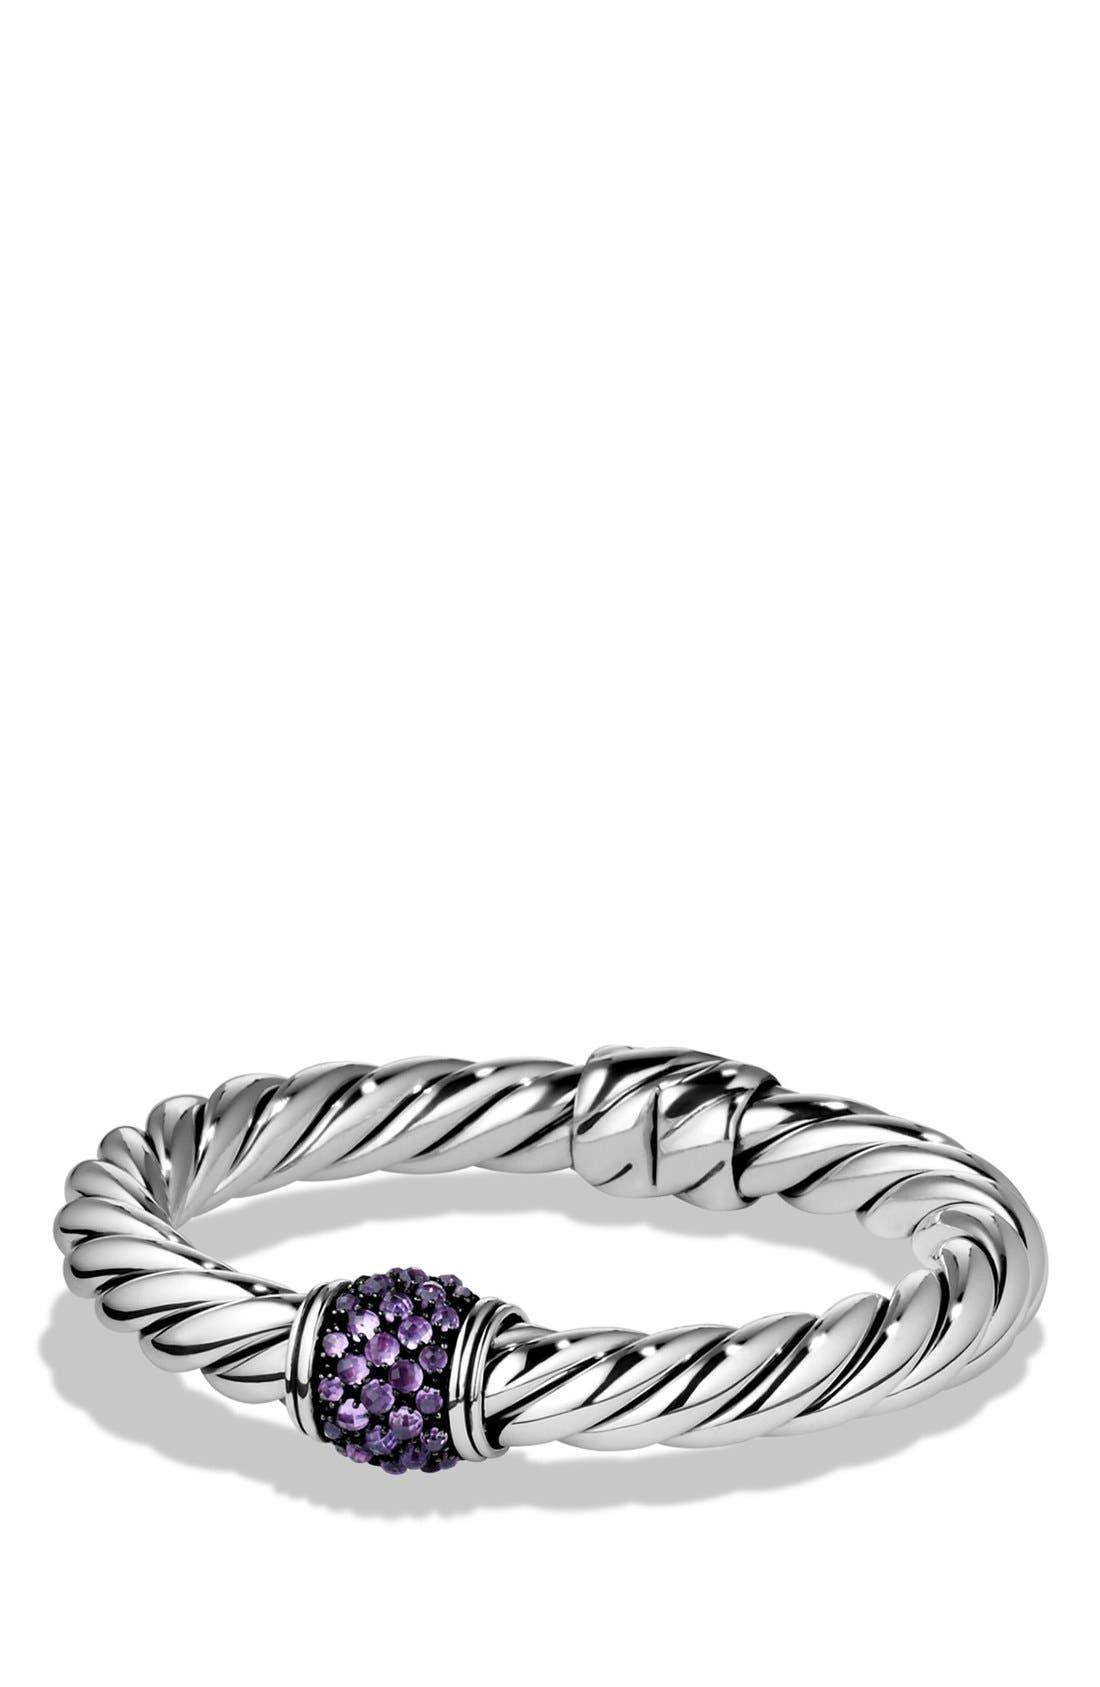 Main Image - David Yurman 'Osetra' Bracelet with Semiprecious Stone